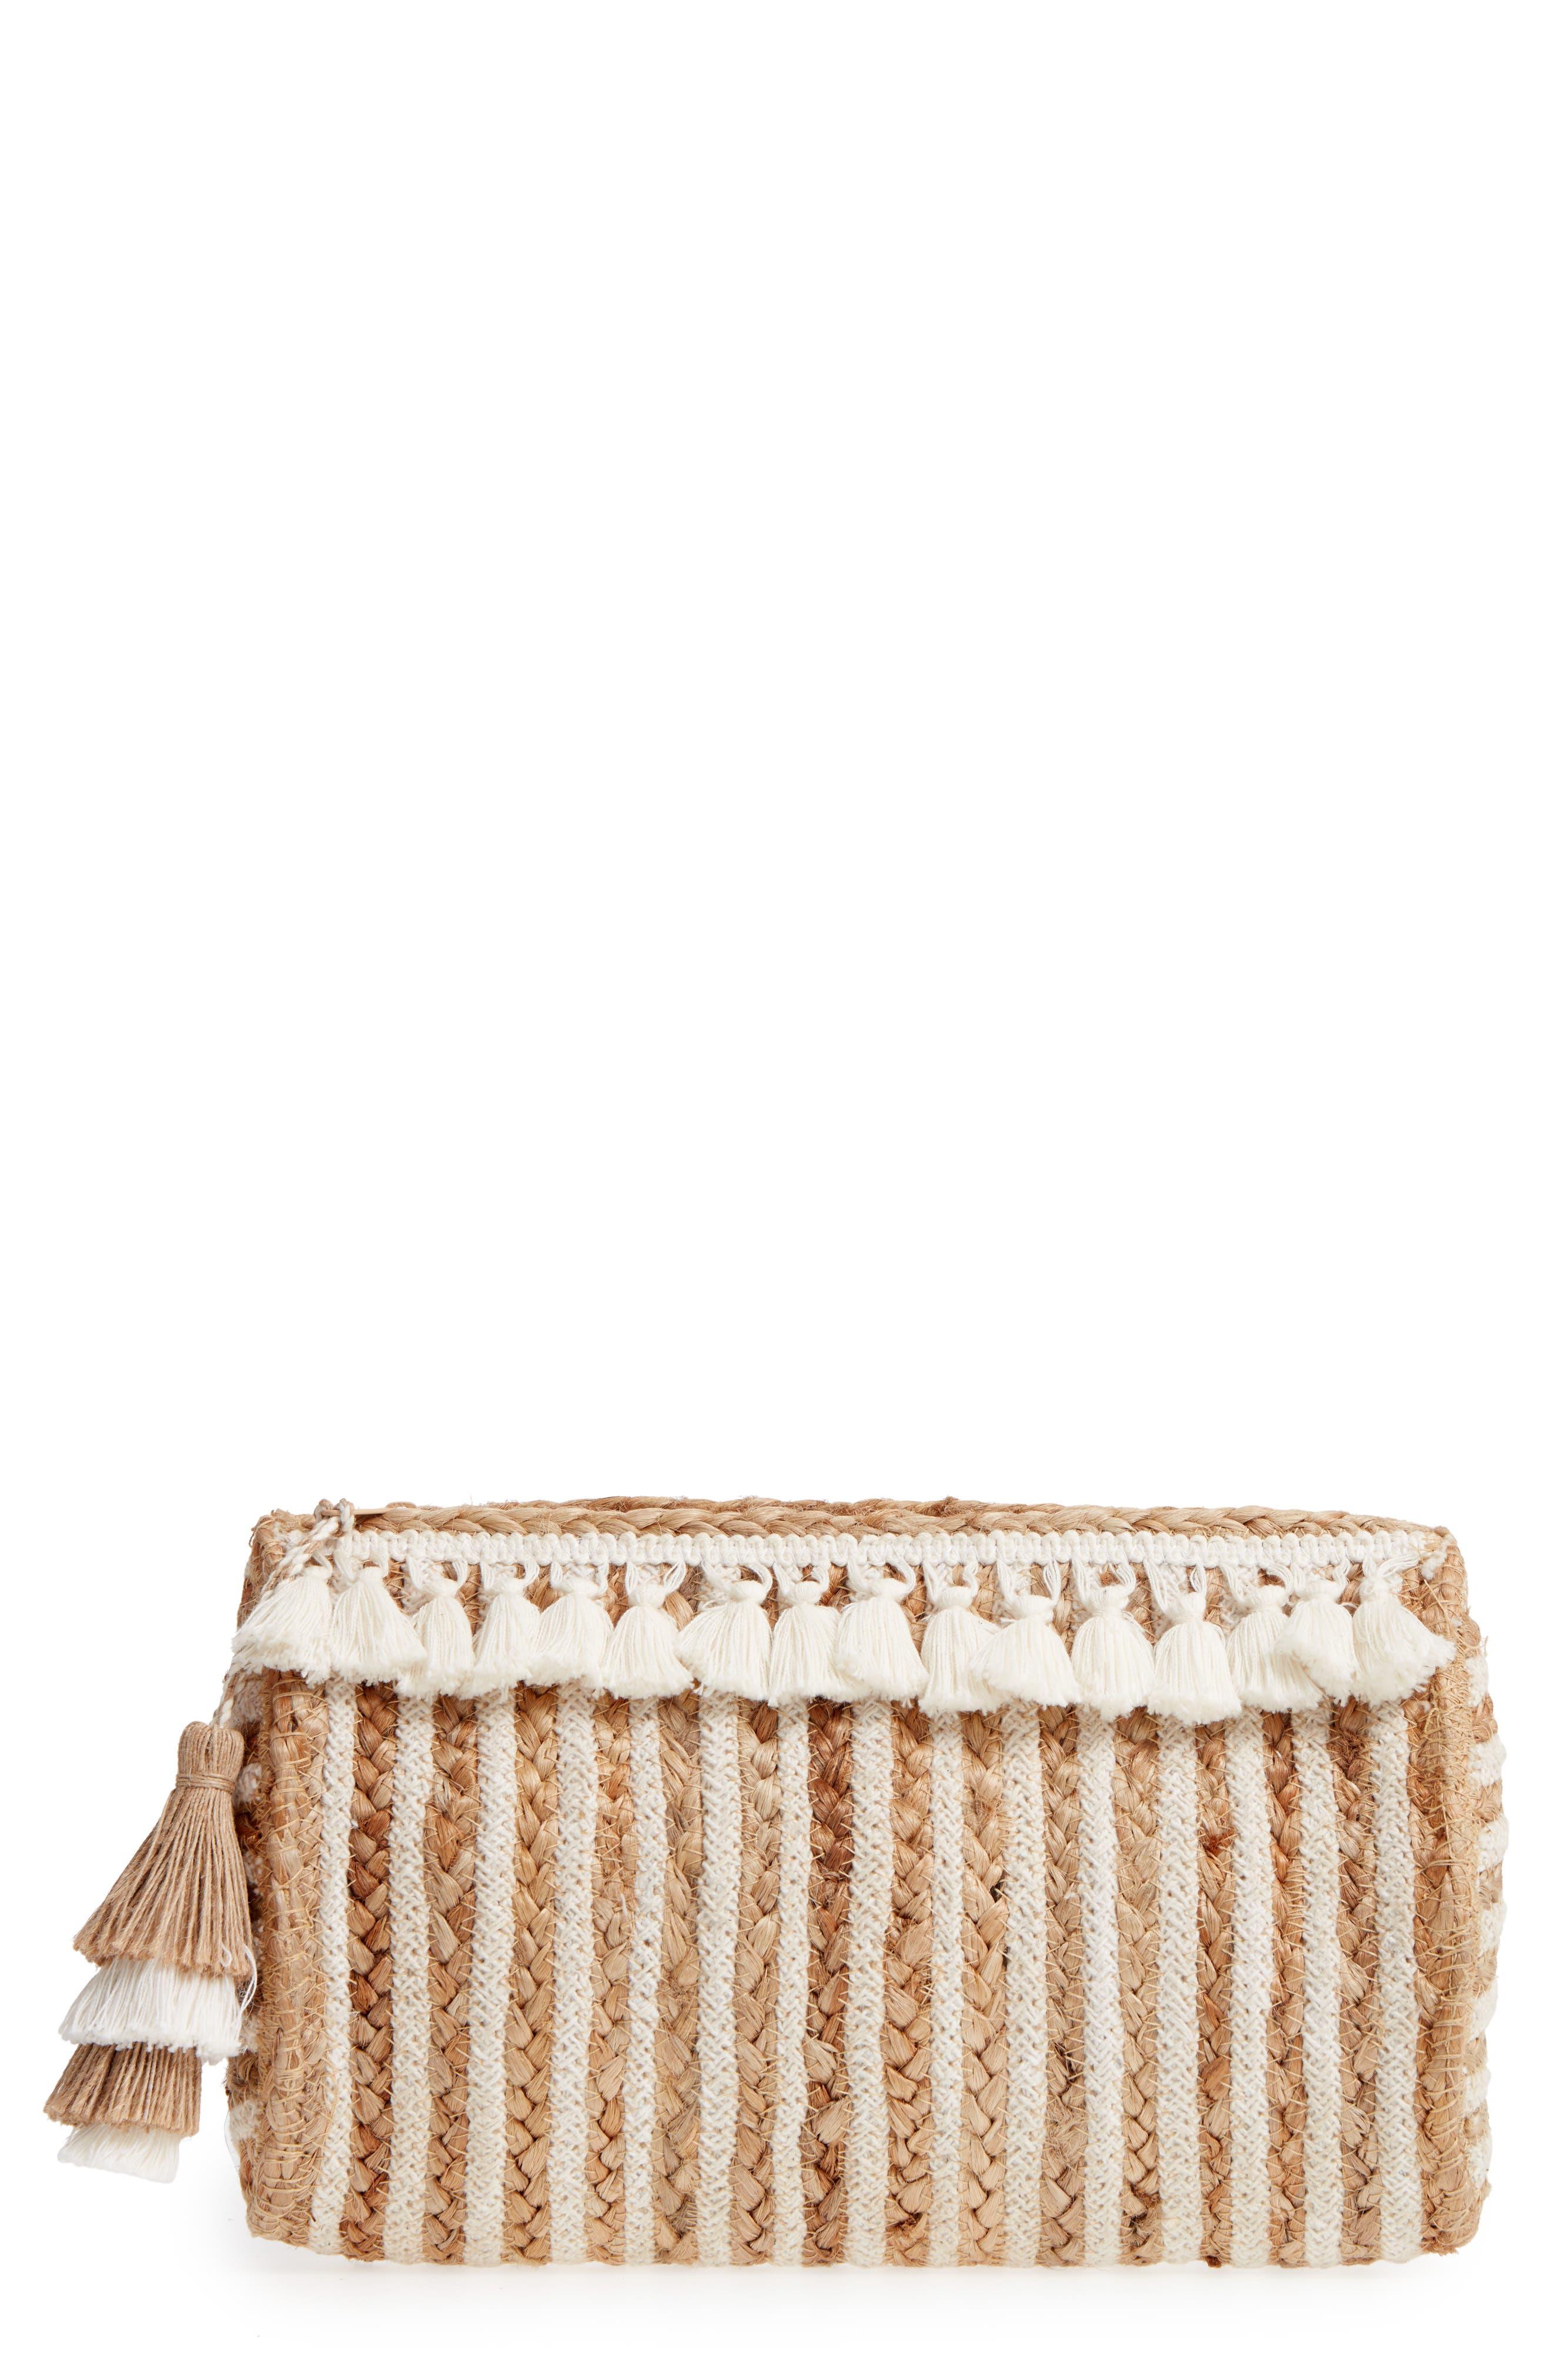 Mare Straw Clutch,                         Main,                         color,